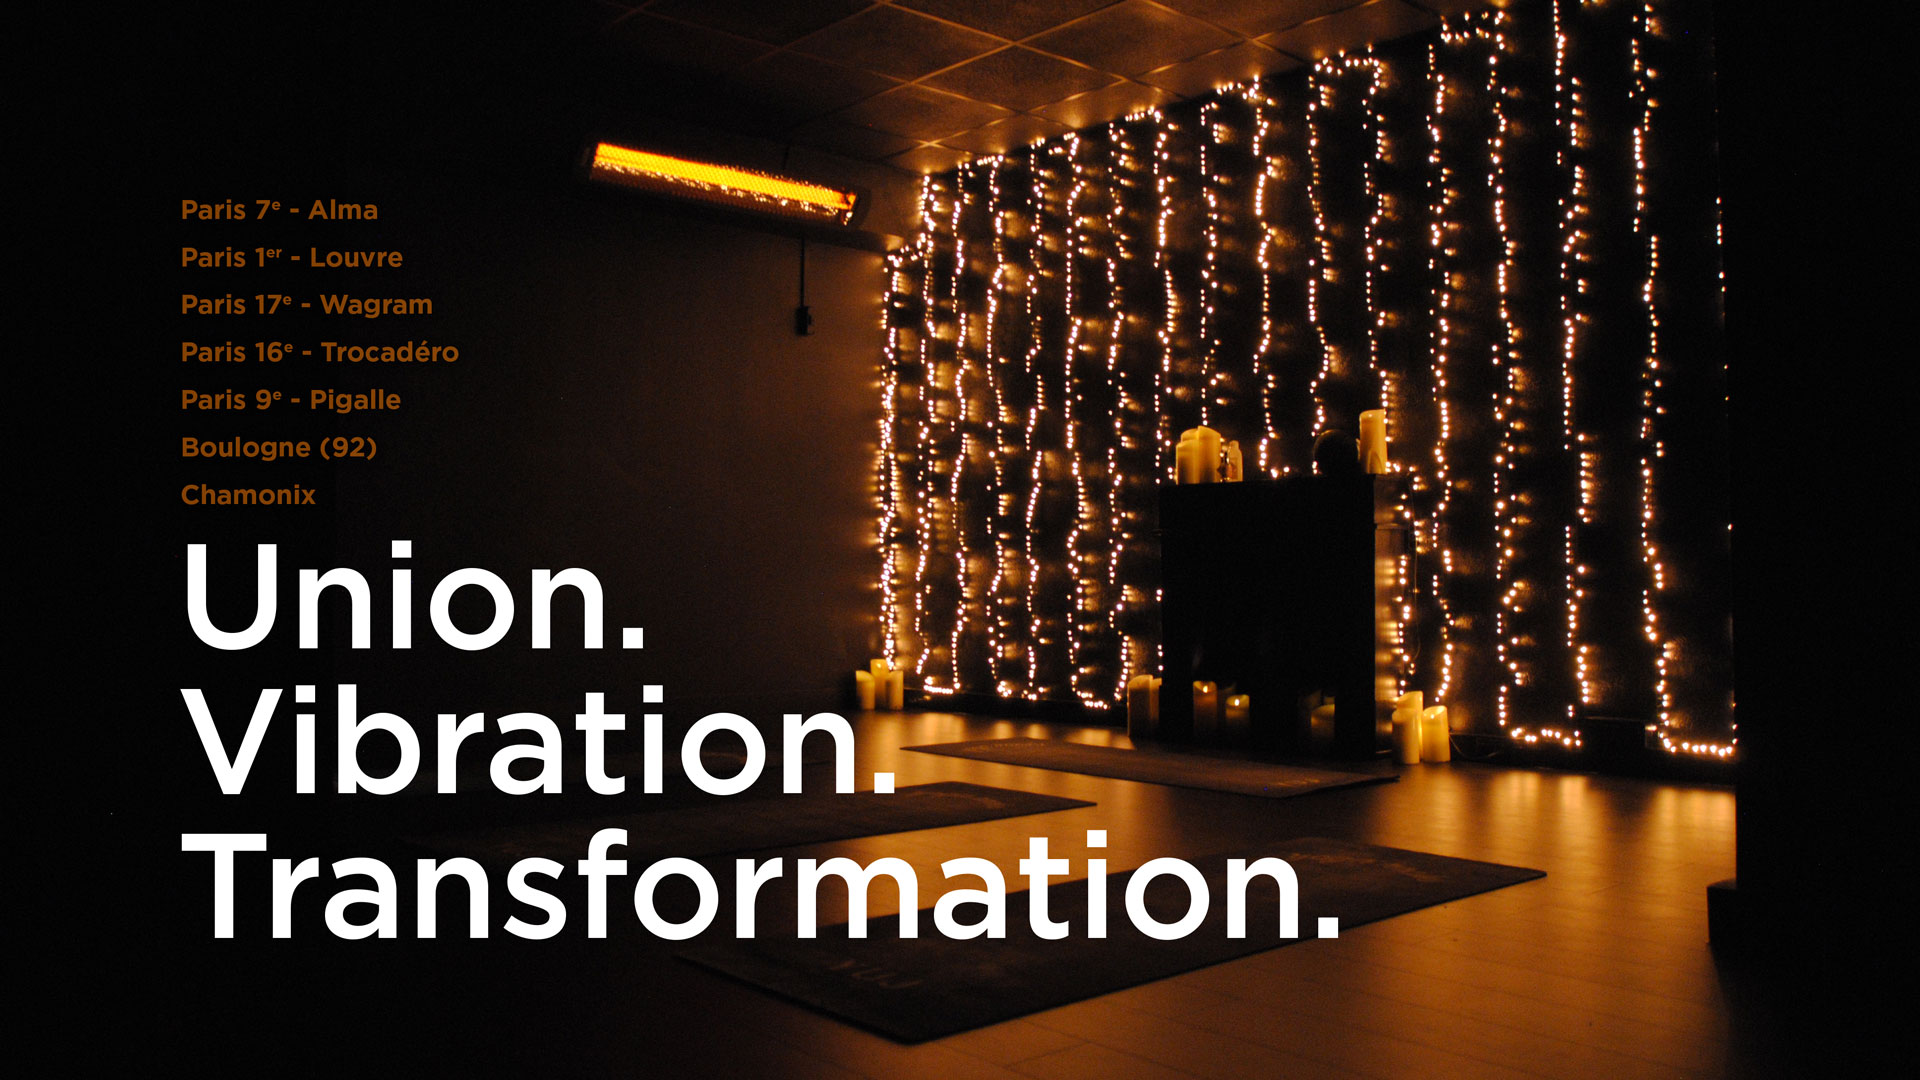 header-union-vibration-transformation-yys